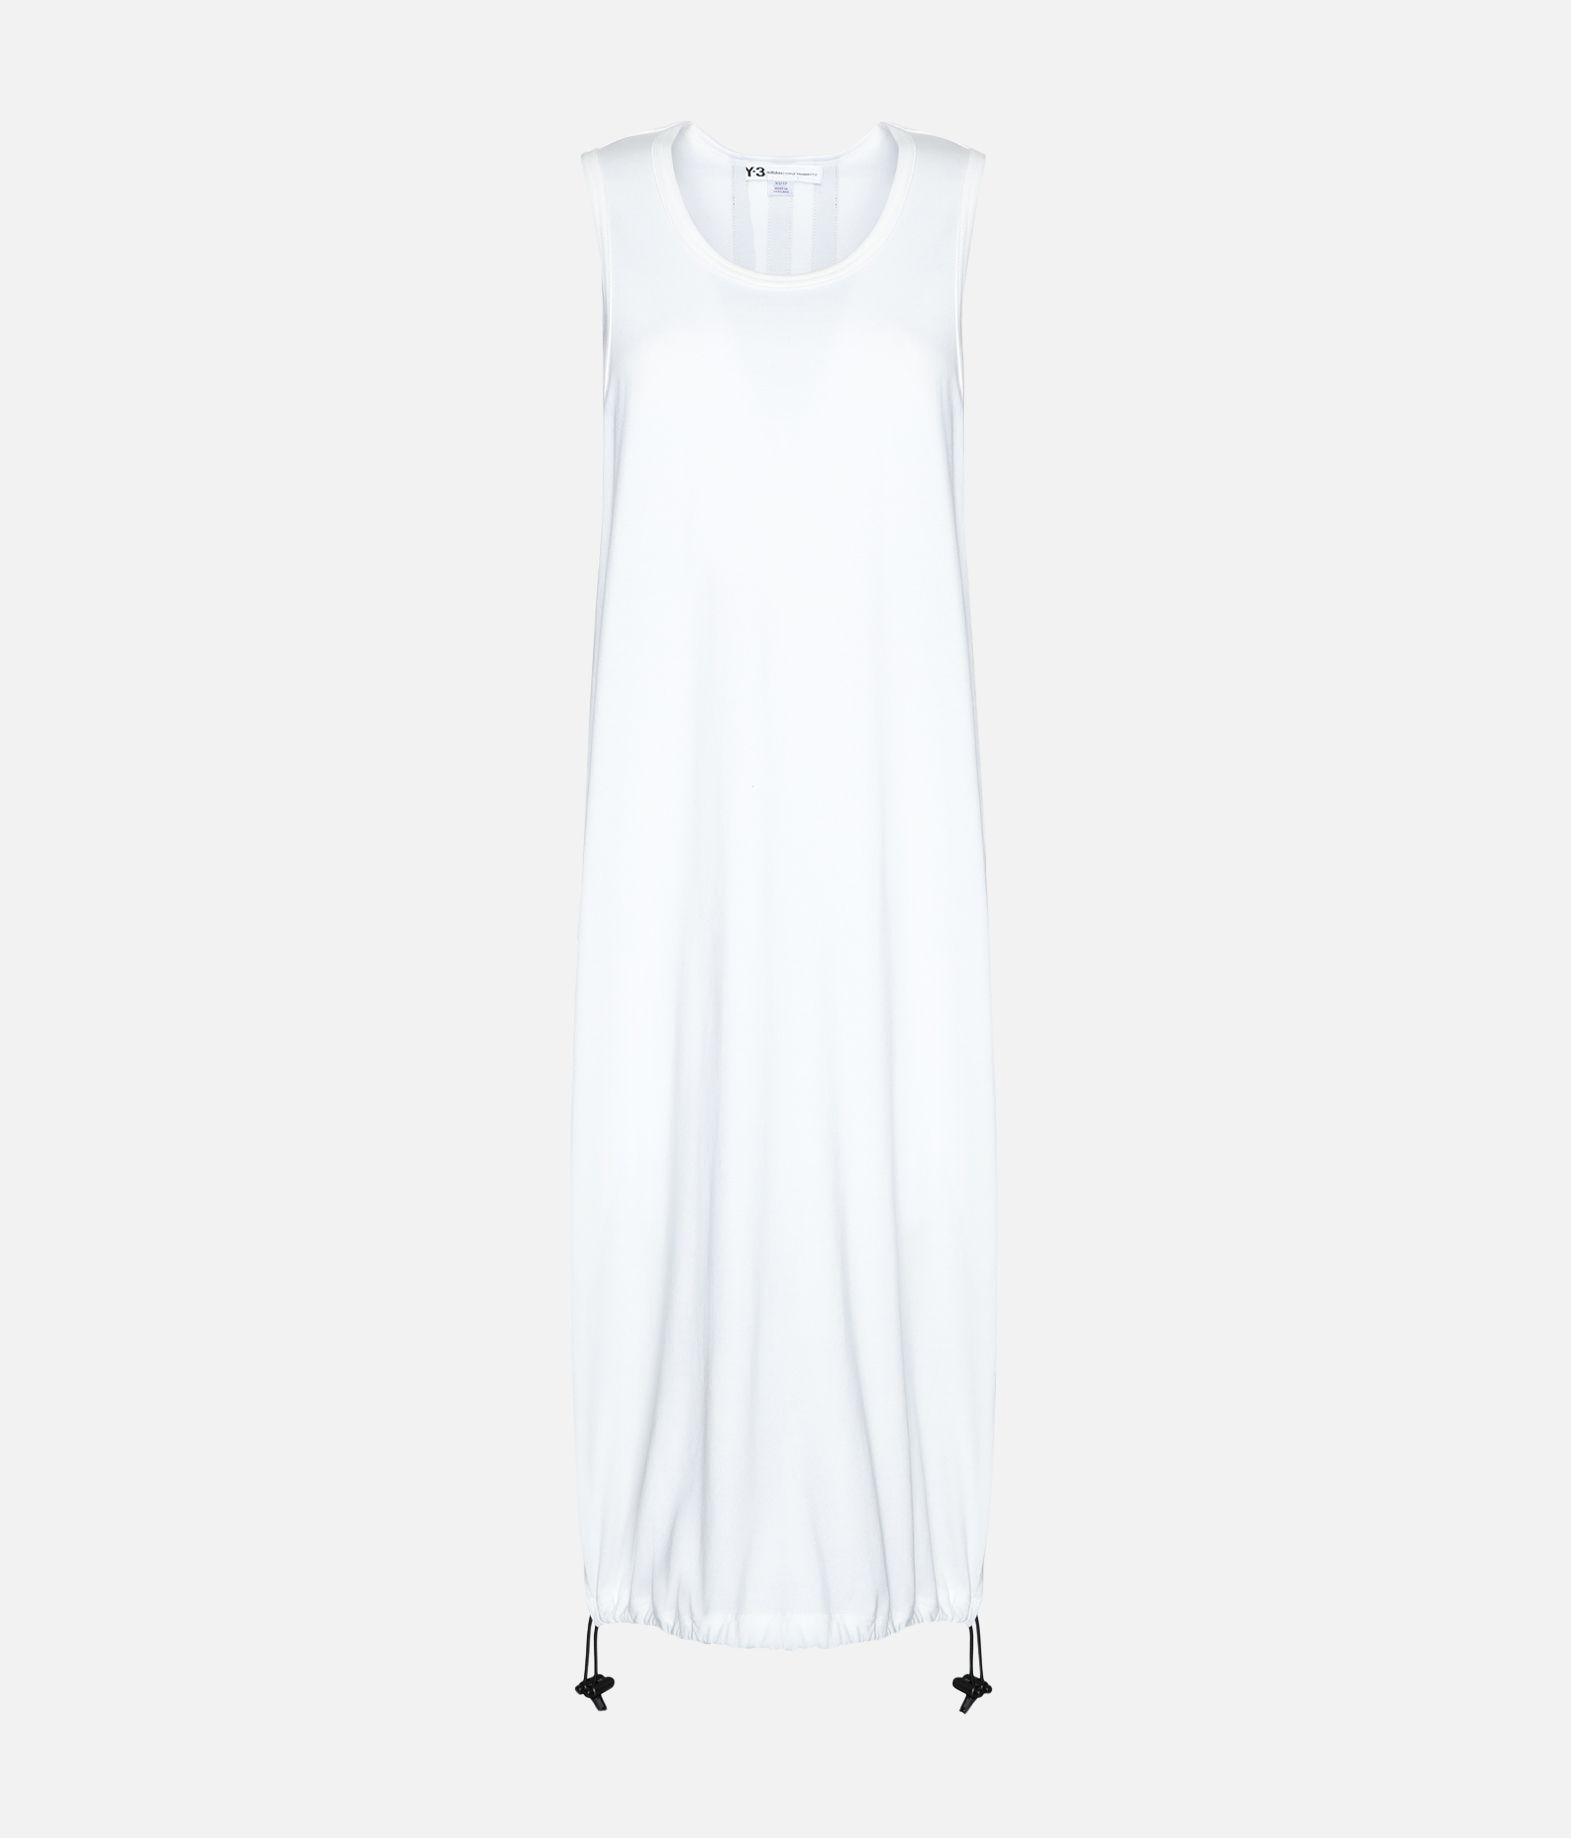 Y-3 Y-3 Drawstring Long Tank Top Sleeveless t-shirt Woman f